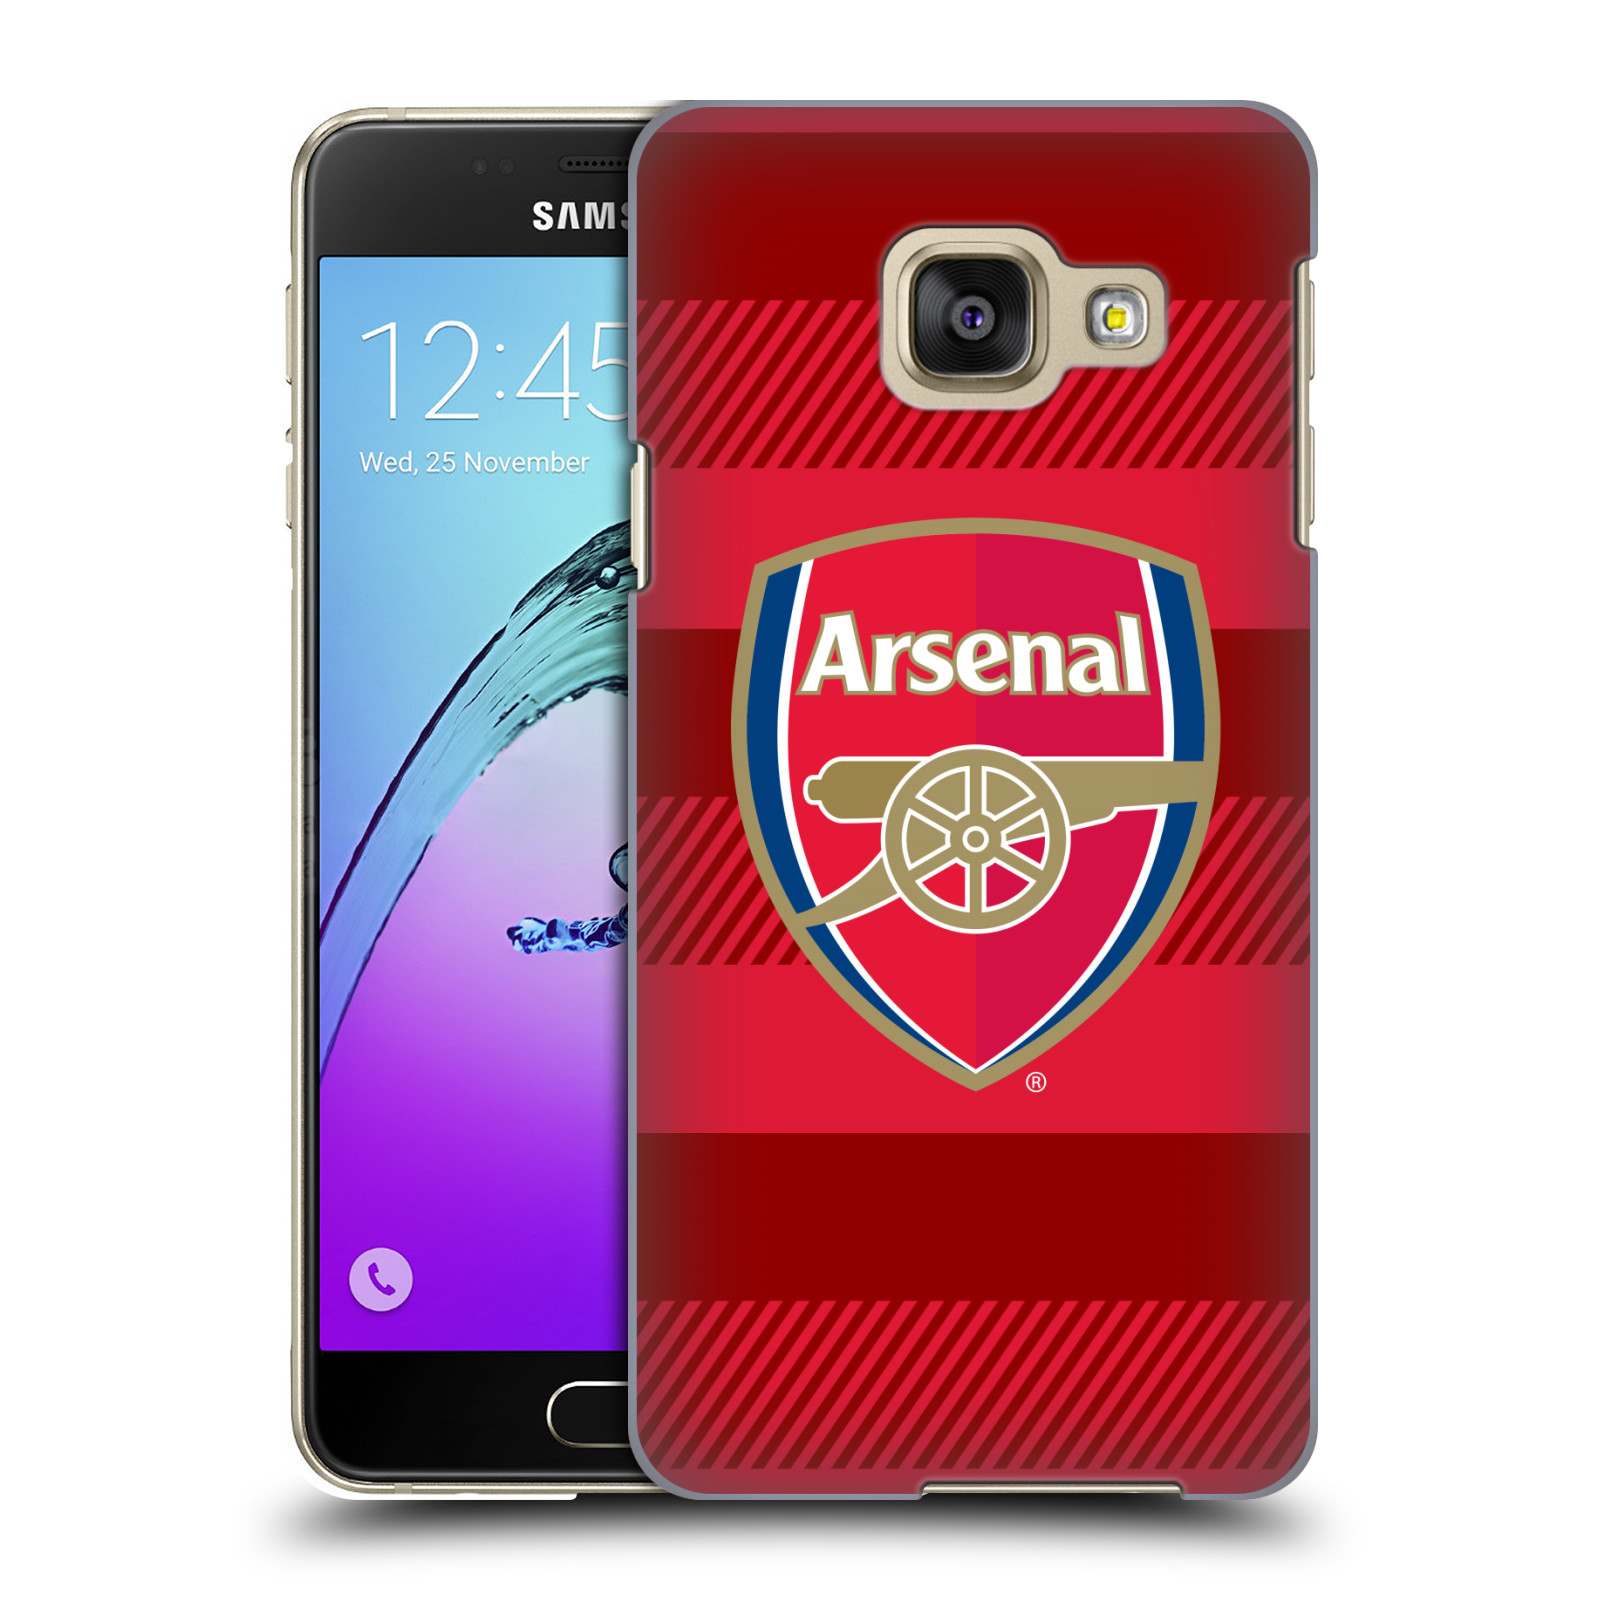 Plastové pouzdro na mobil Samsung Galaxy A3 (2016) - Head Case - Arsenal FC - Logo s pruhy